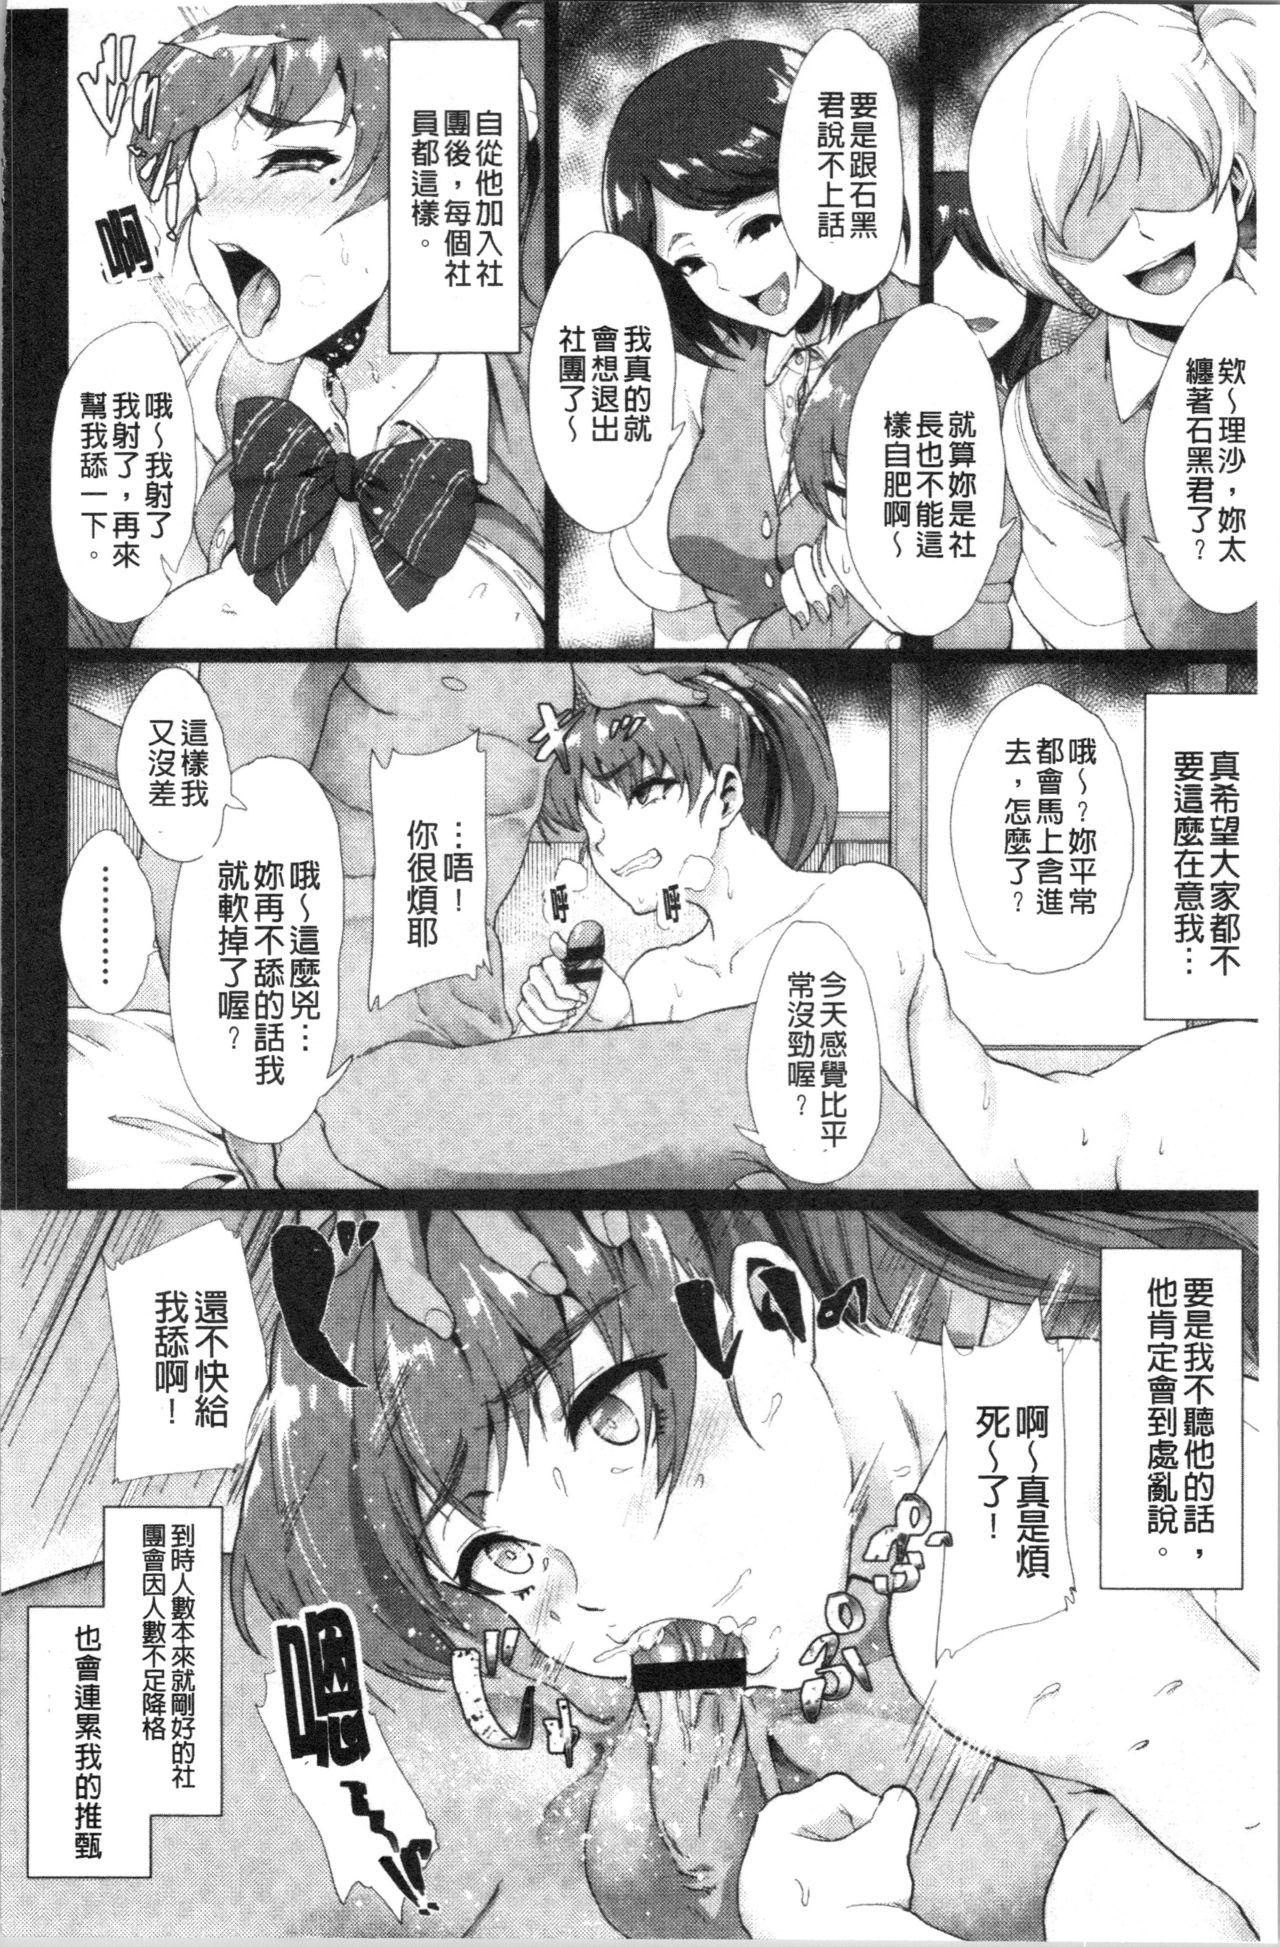 Kanojo ga SEX ni nare teru wake | 女友對激情性愛變很習慣的理由 74